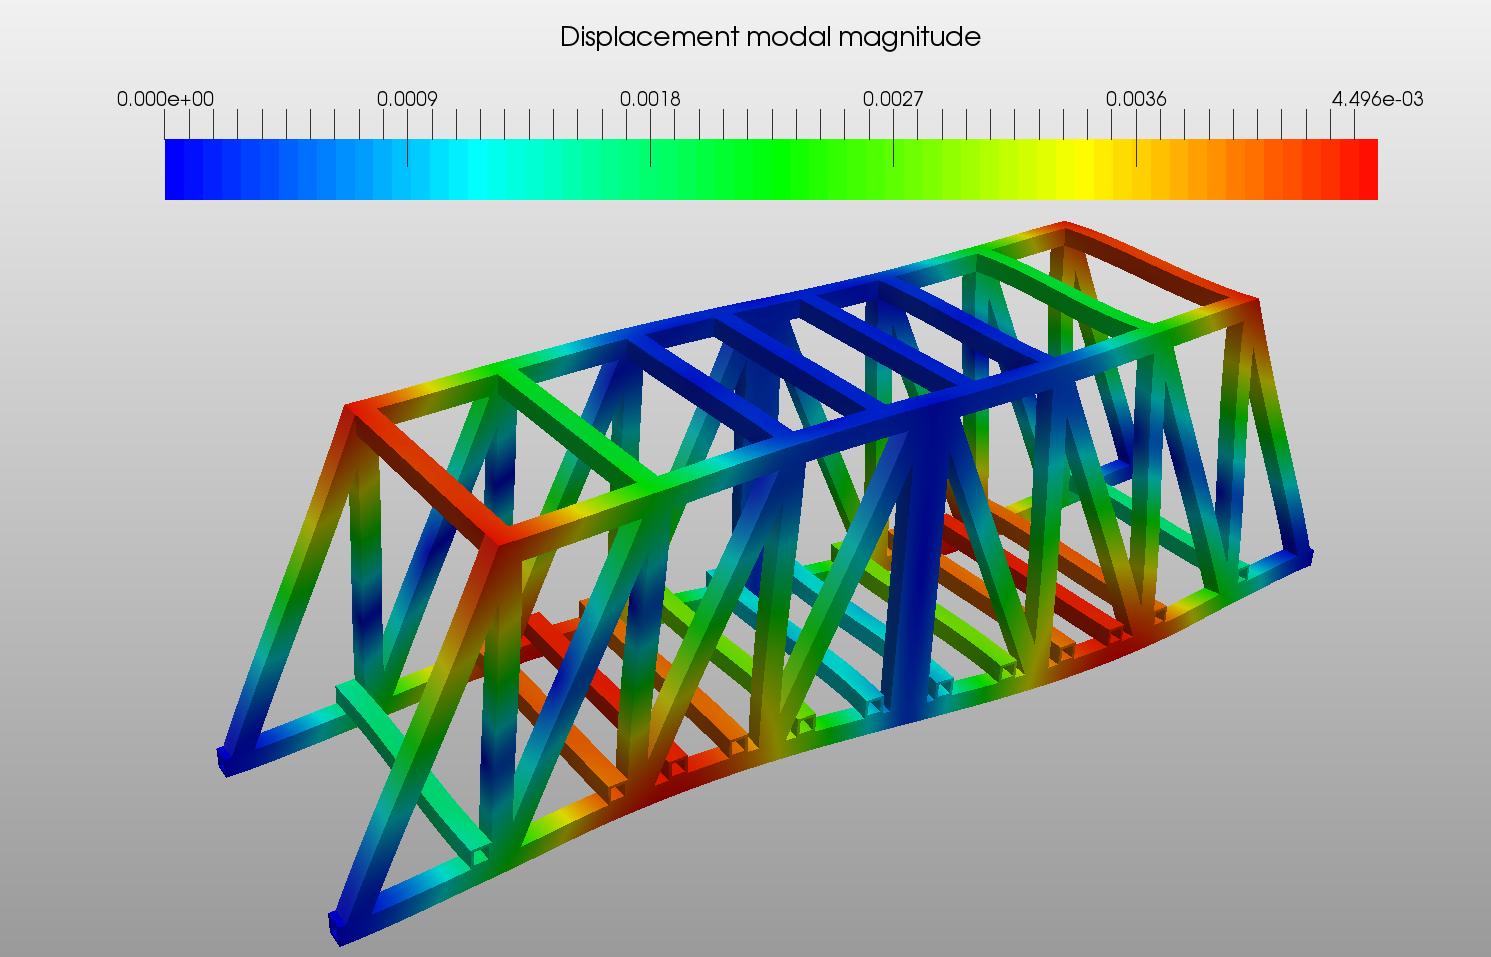 truss bridge eigenfrequency analysis simulation project by